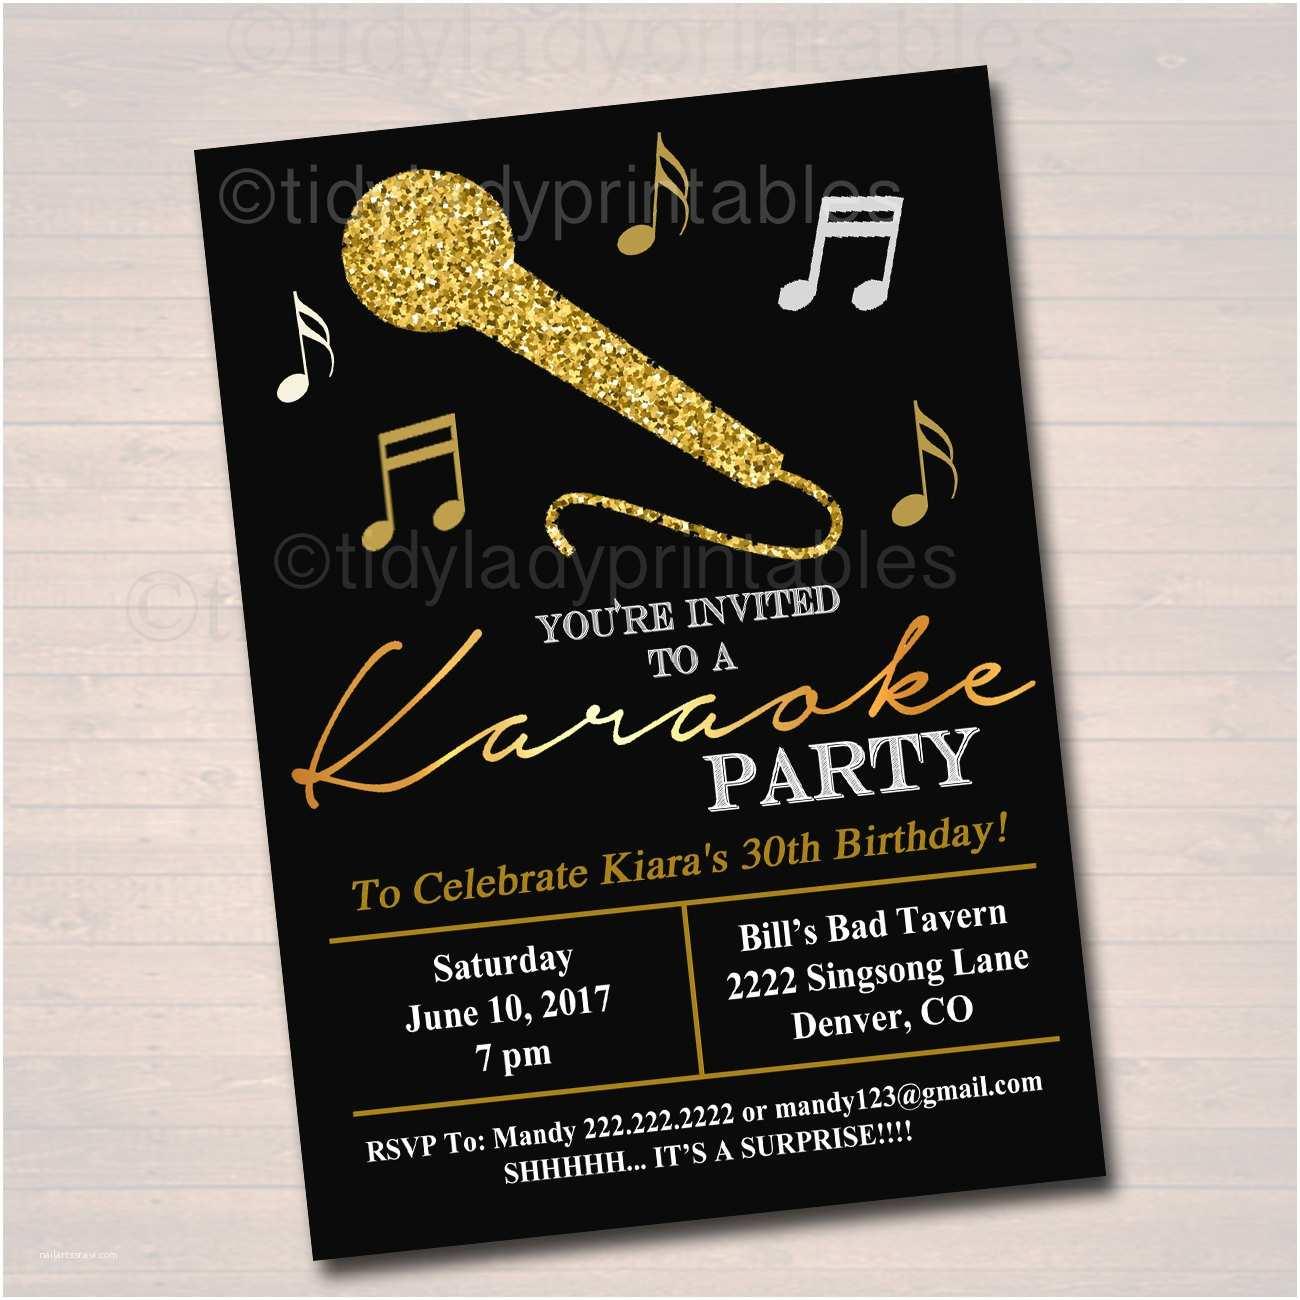 Karaoke Party S Editable Adult Karaoke Party  Birthday